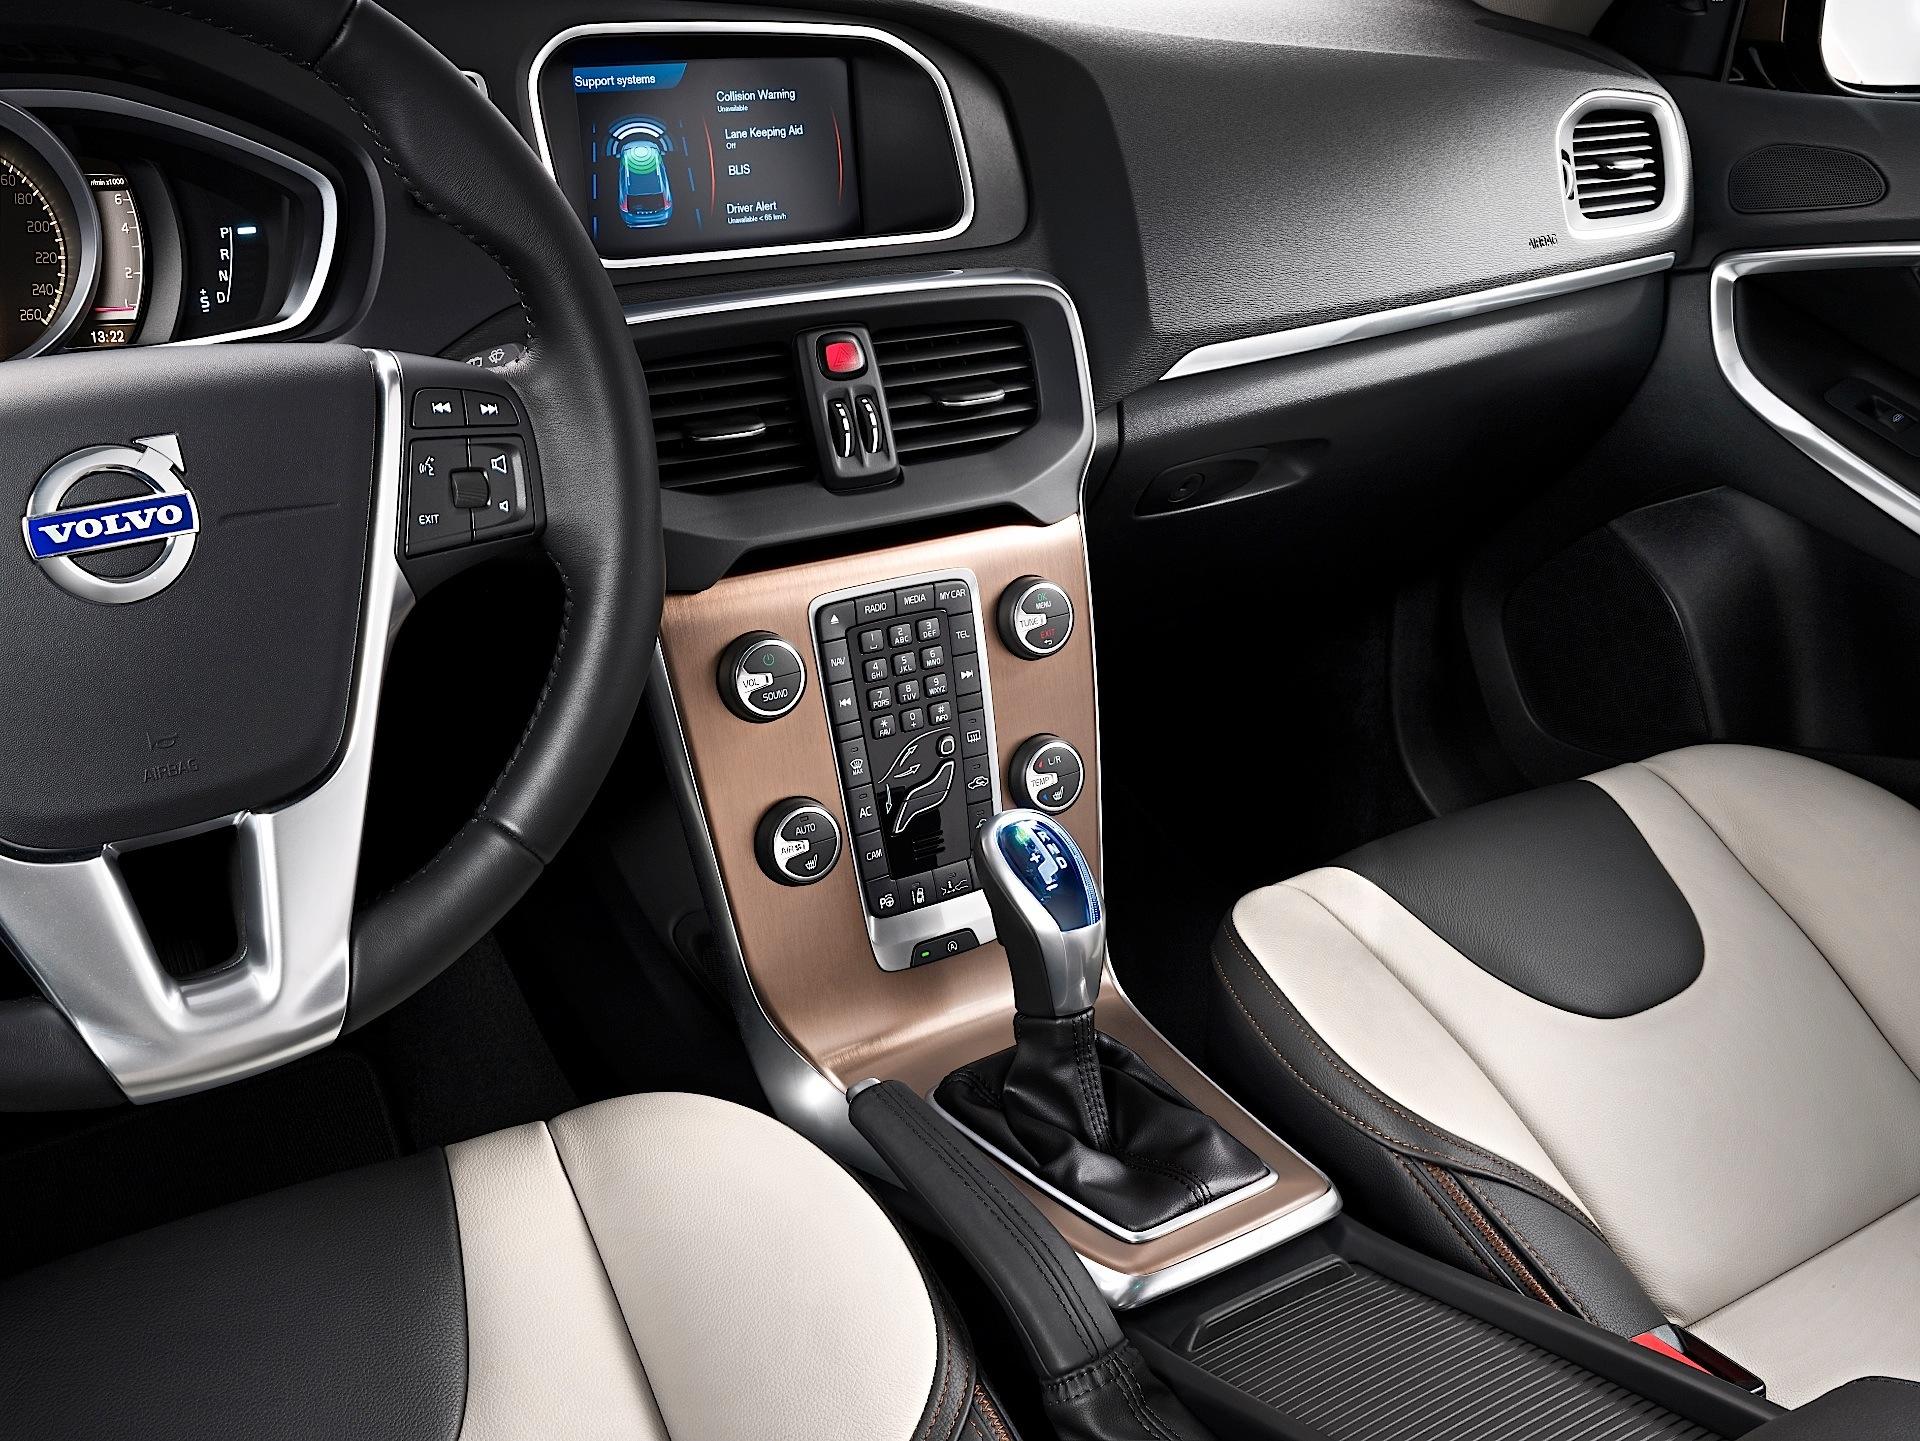 Volvo v60 cross country review 2015 parkers -  Volvo V40 Cross Country 2012 2016